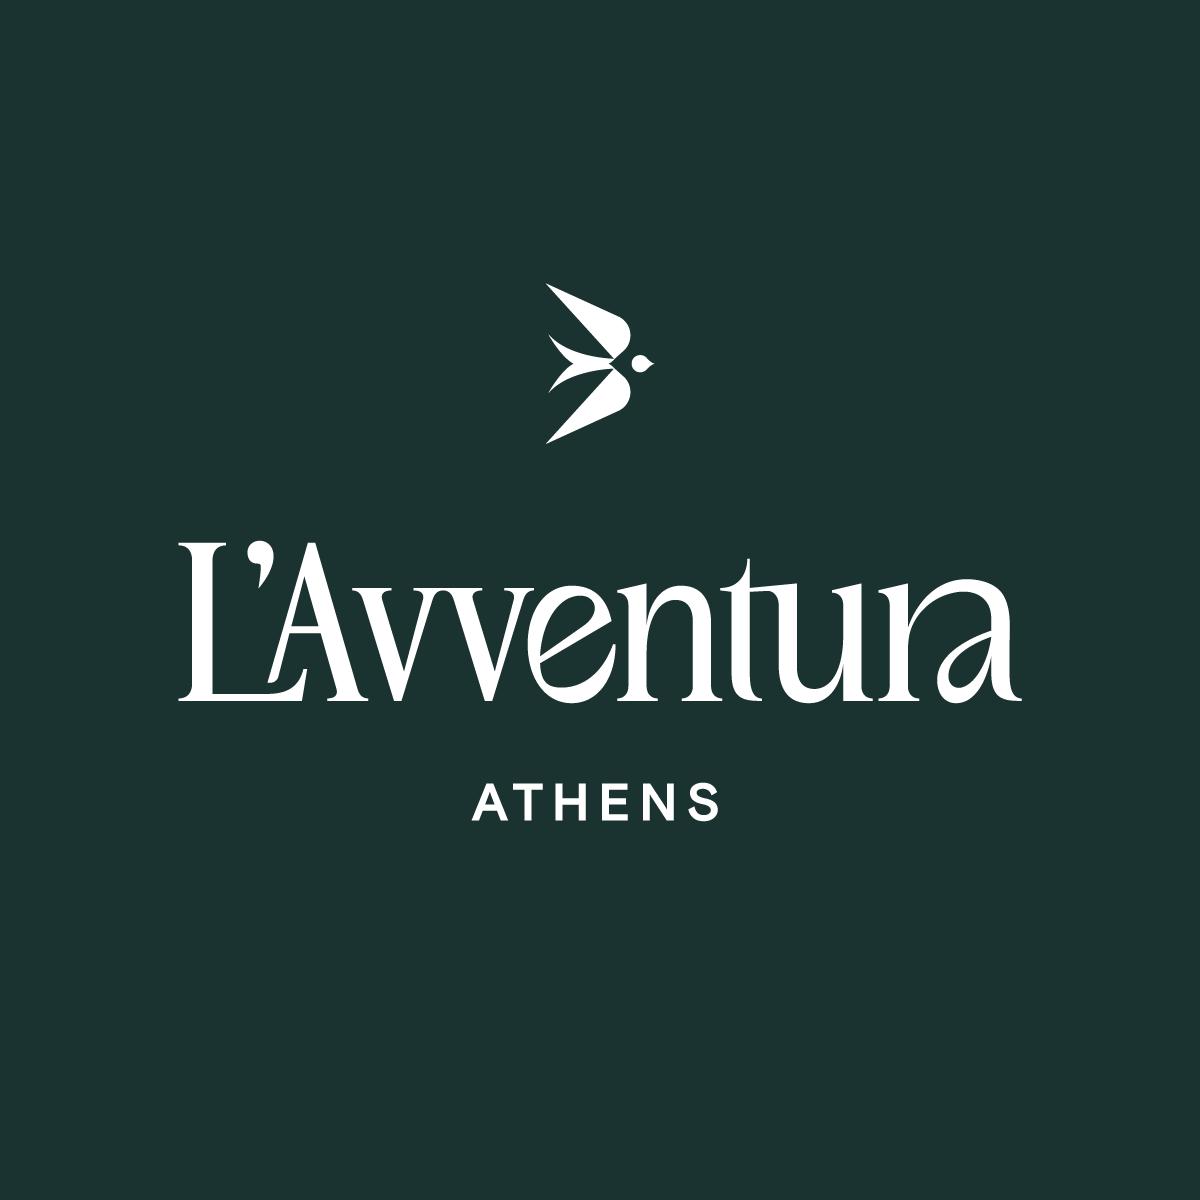 L'Avventura Athens